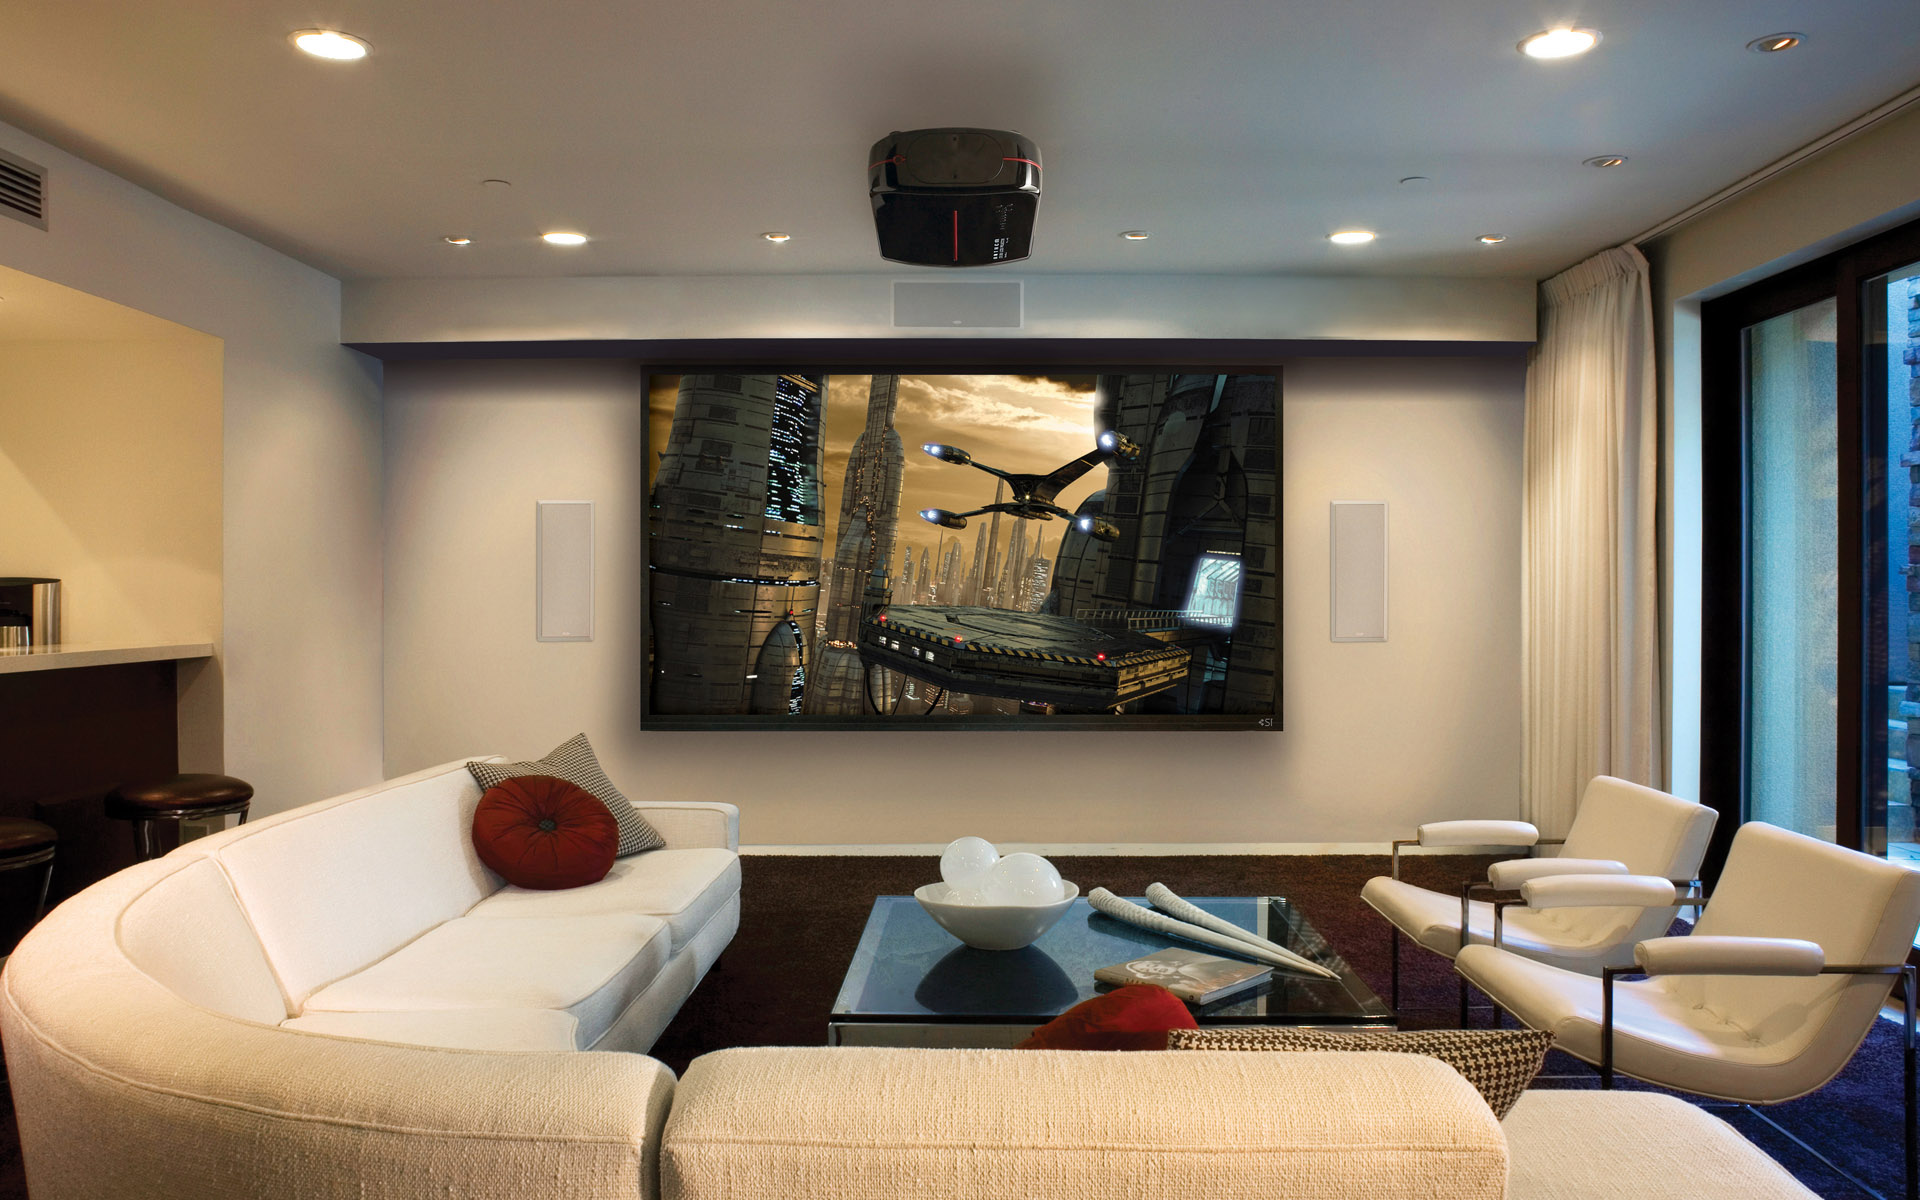 Pin Wallpaper Living Room Ideas 1920x1200 82950 1920x1200